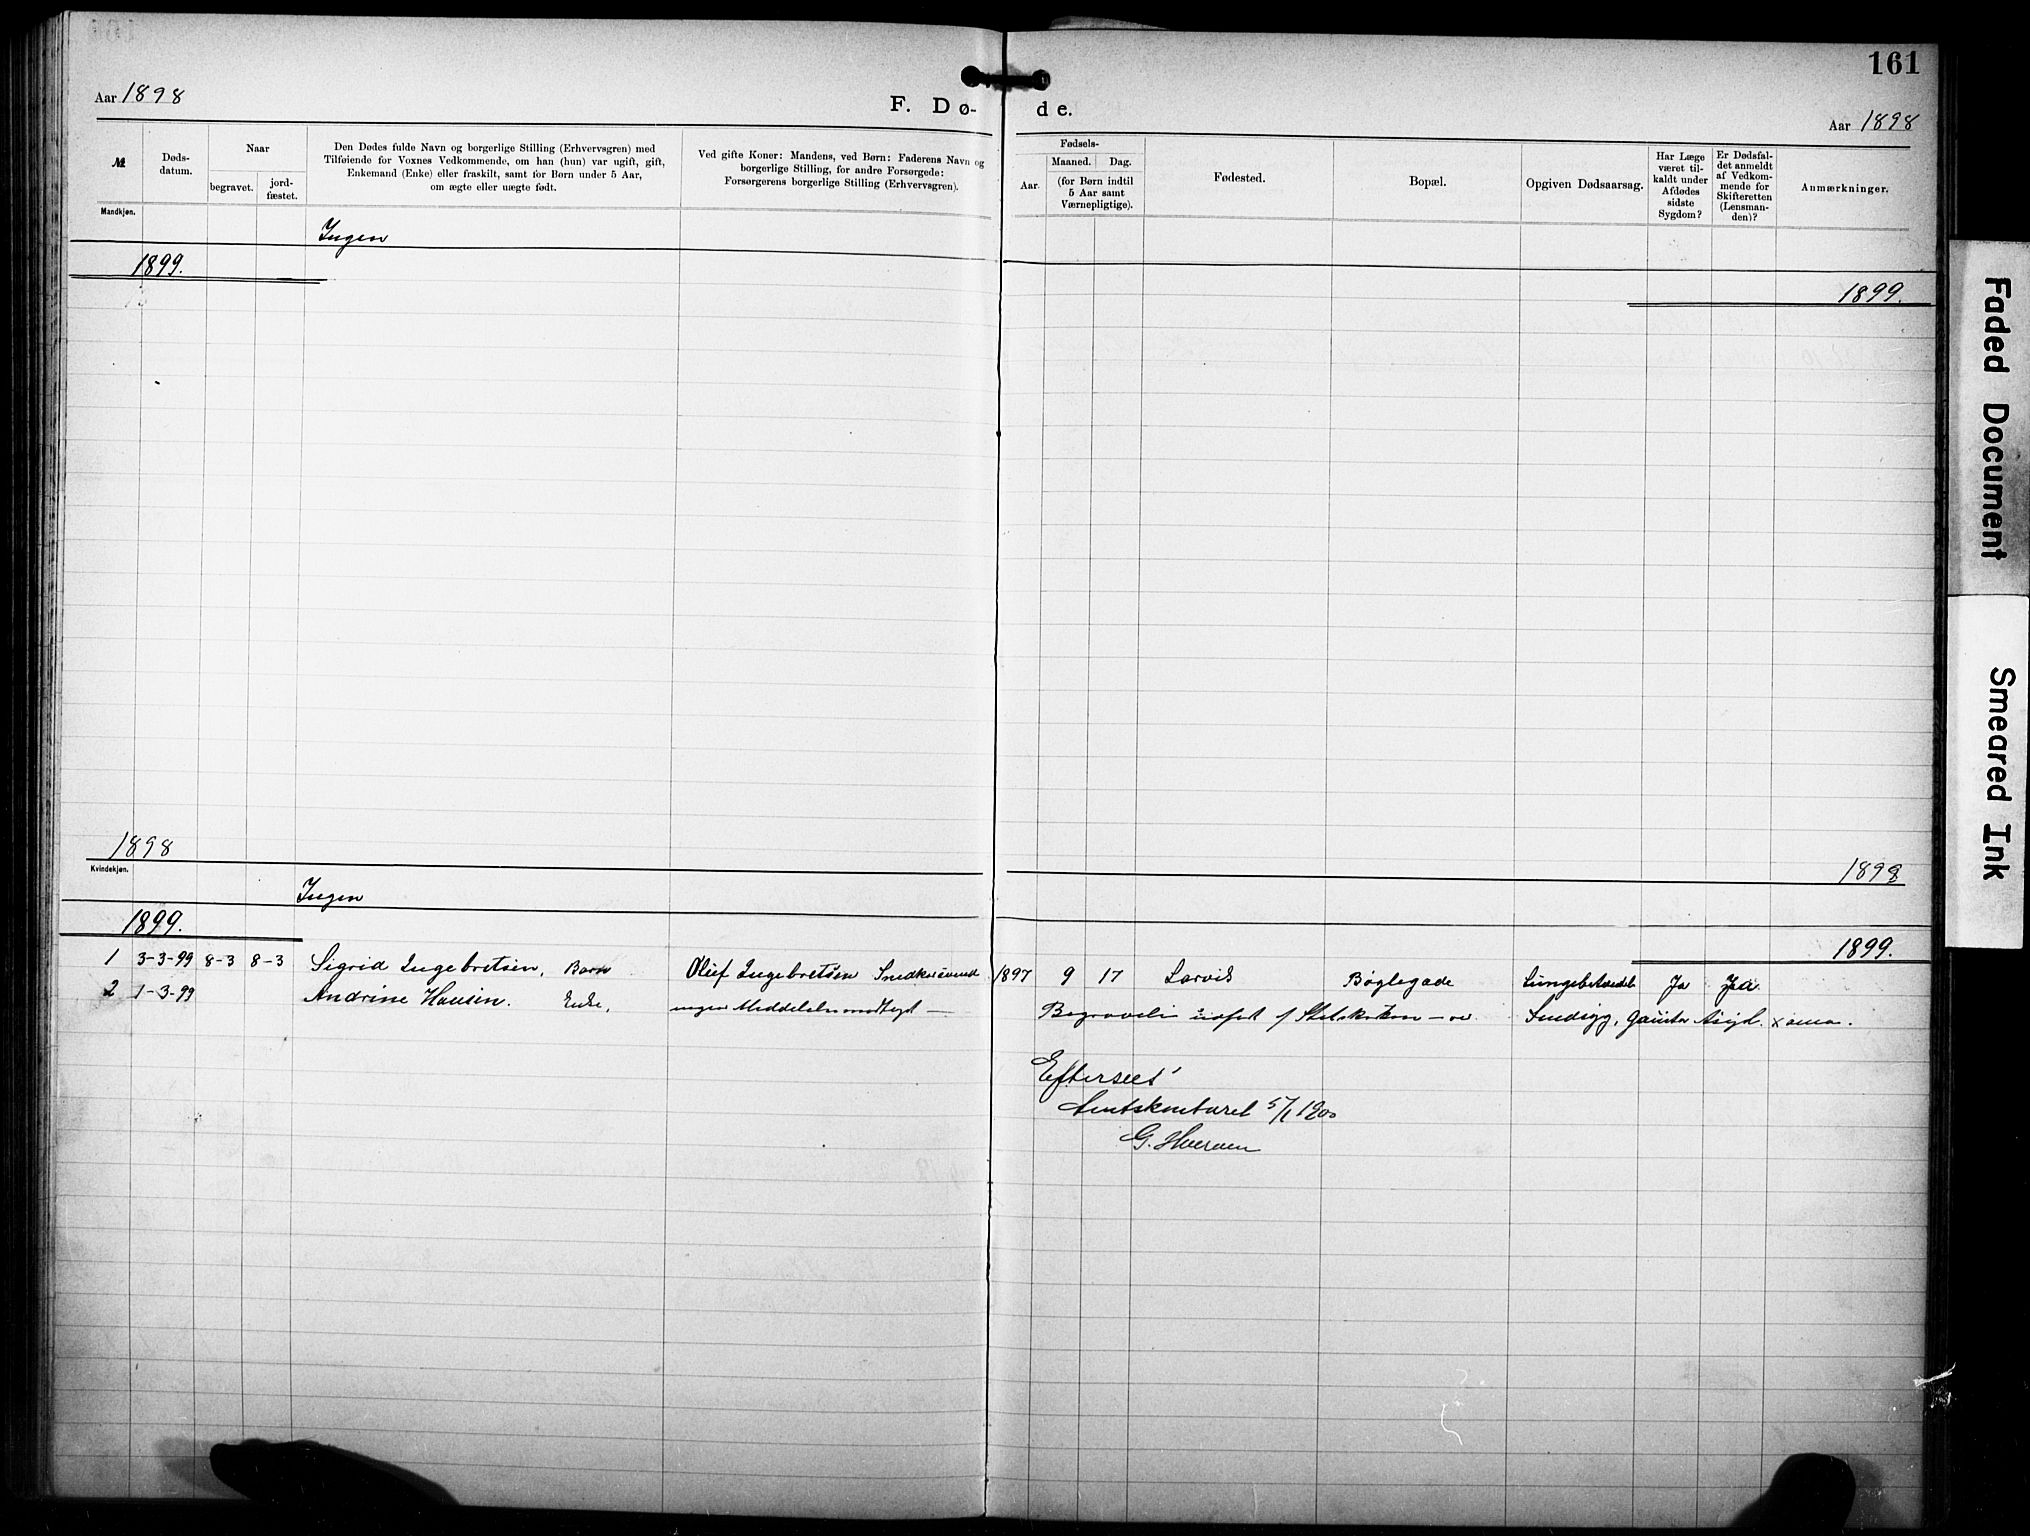 SAKO, Den katolsk-apostoliske menighet i Larvik, F/Fa/L0001: Dissenterprotokoll nr. 1, 1892-1933, s. 161